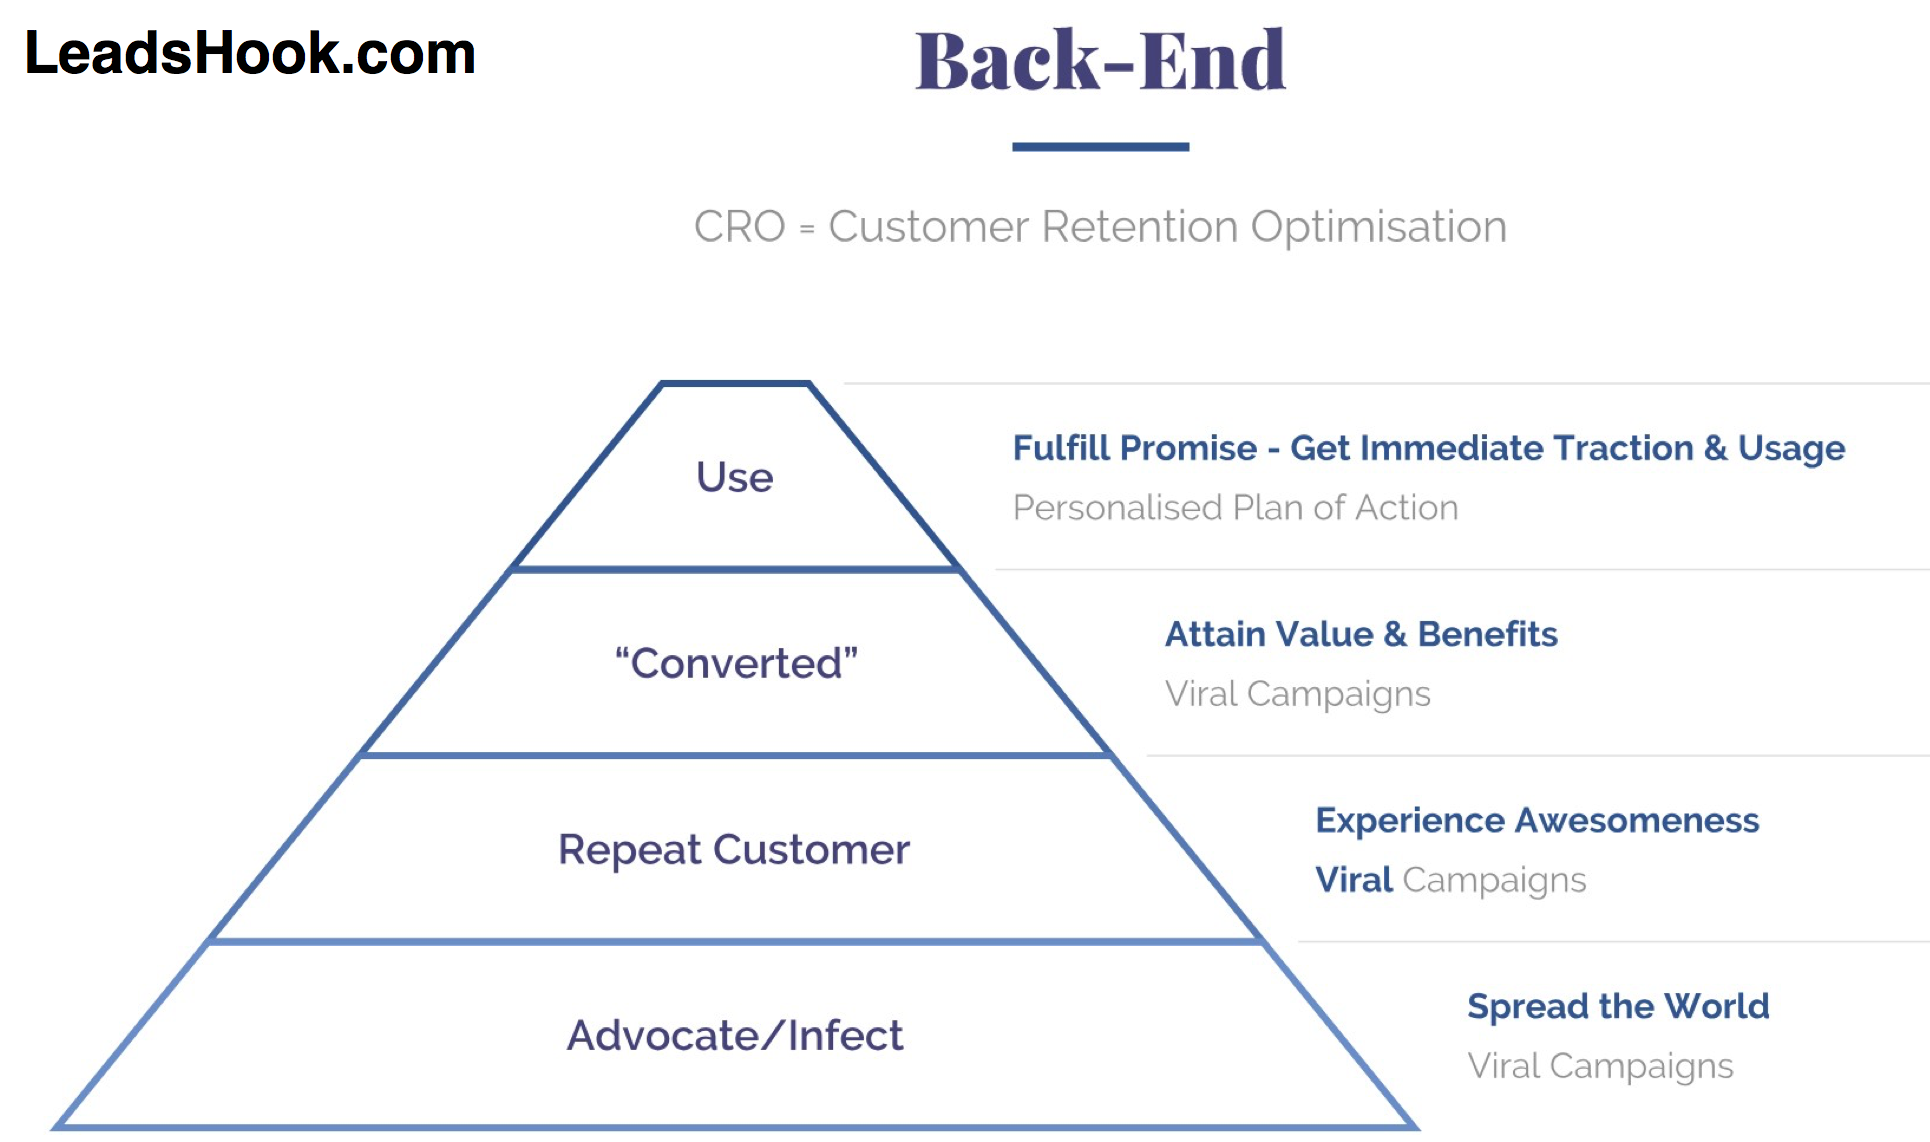 Marketing Backend - Customer Retention Optimisation